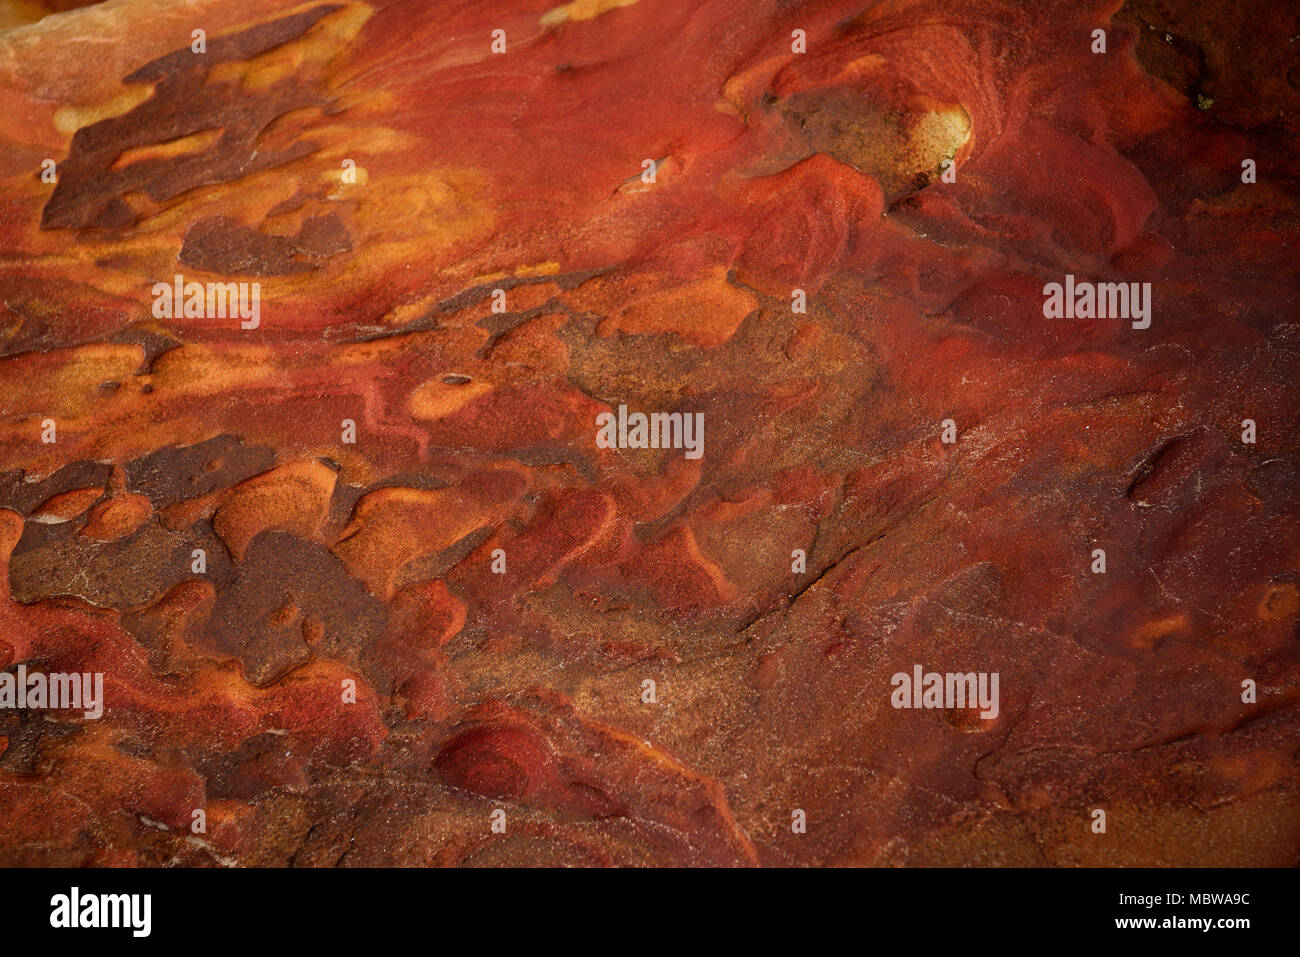 St Francis Bay Stockfotos & St Francis Bay Bilder - Alamy